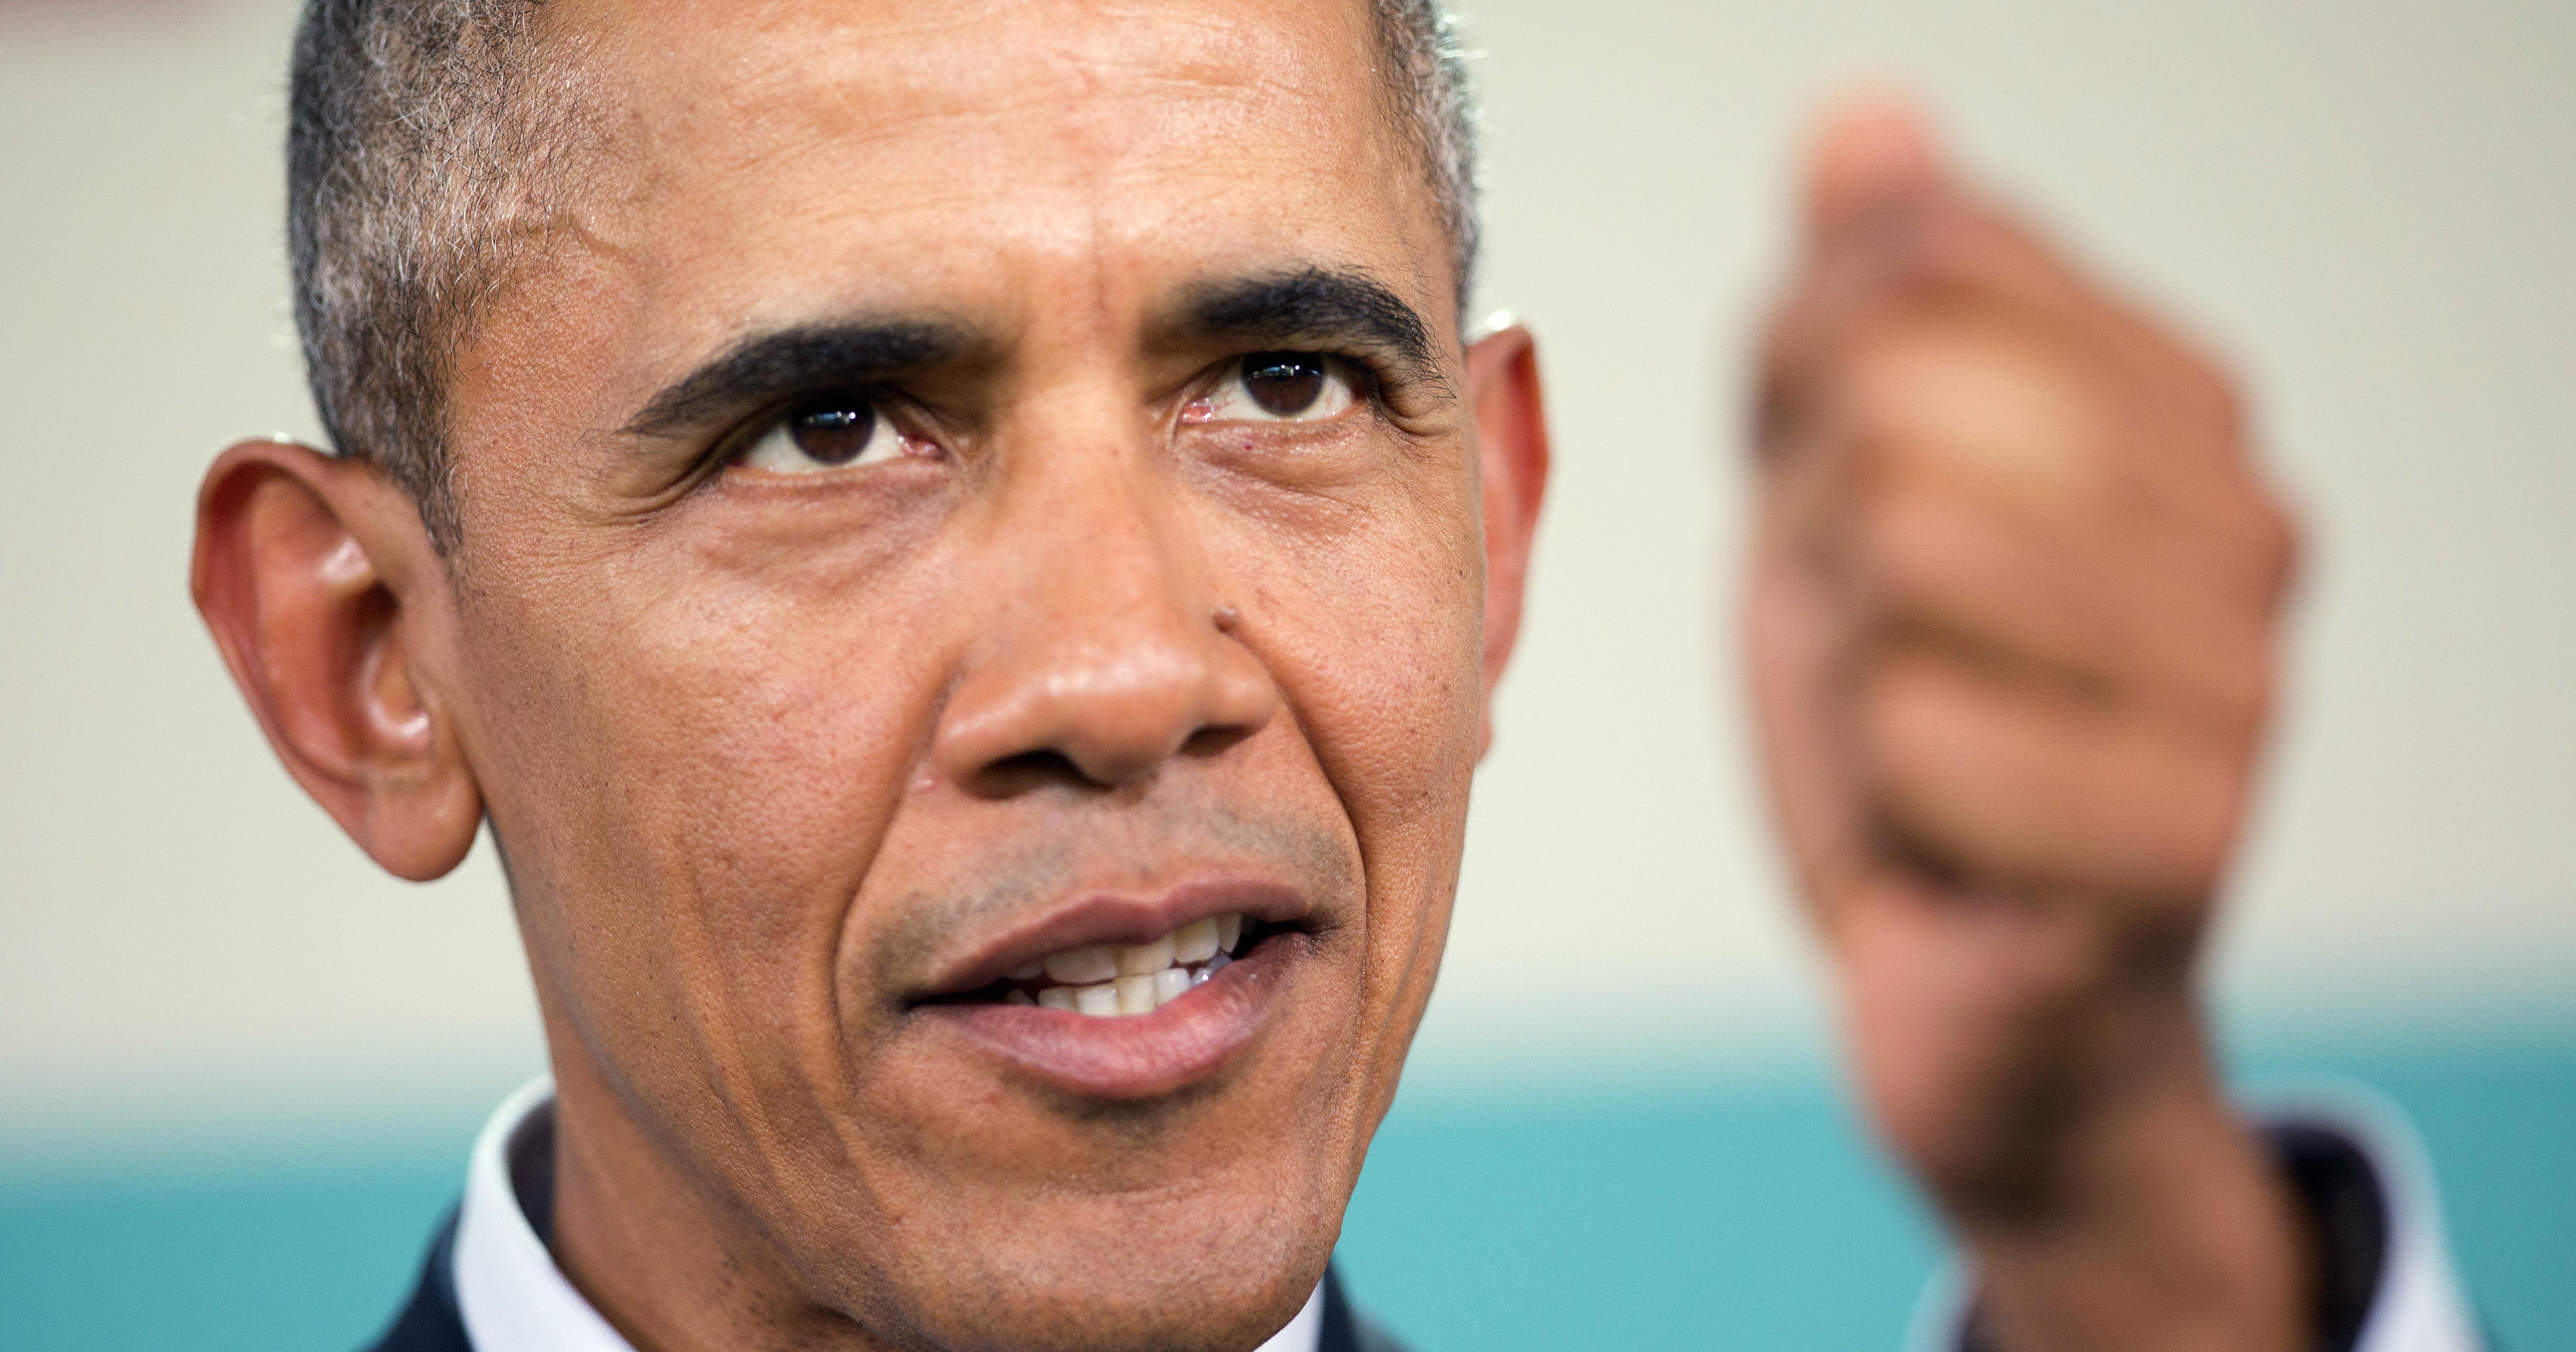 Barack Obama speaks in Rancho Mirage, Calif. on Feb. 16, 2016.